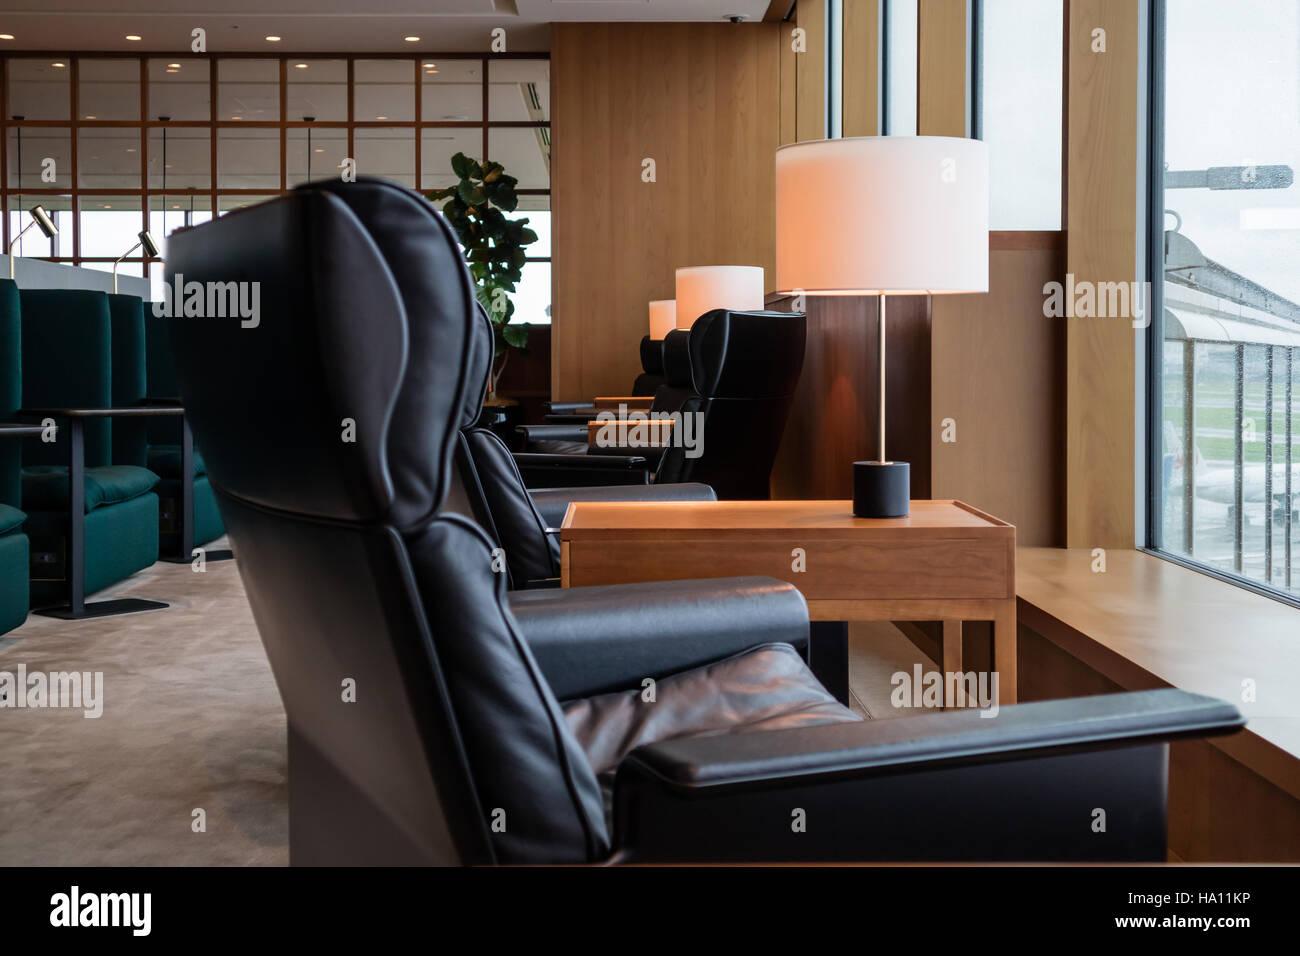 Haneta airport cosy lounge, Tokyo, Japan - Stock Image